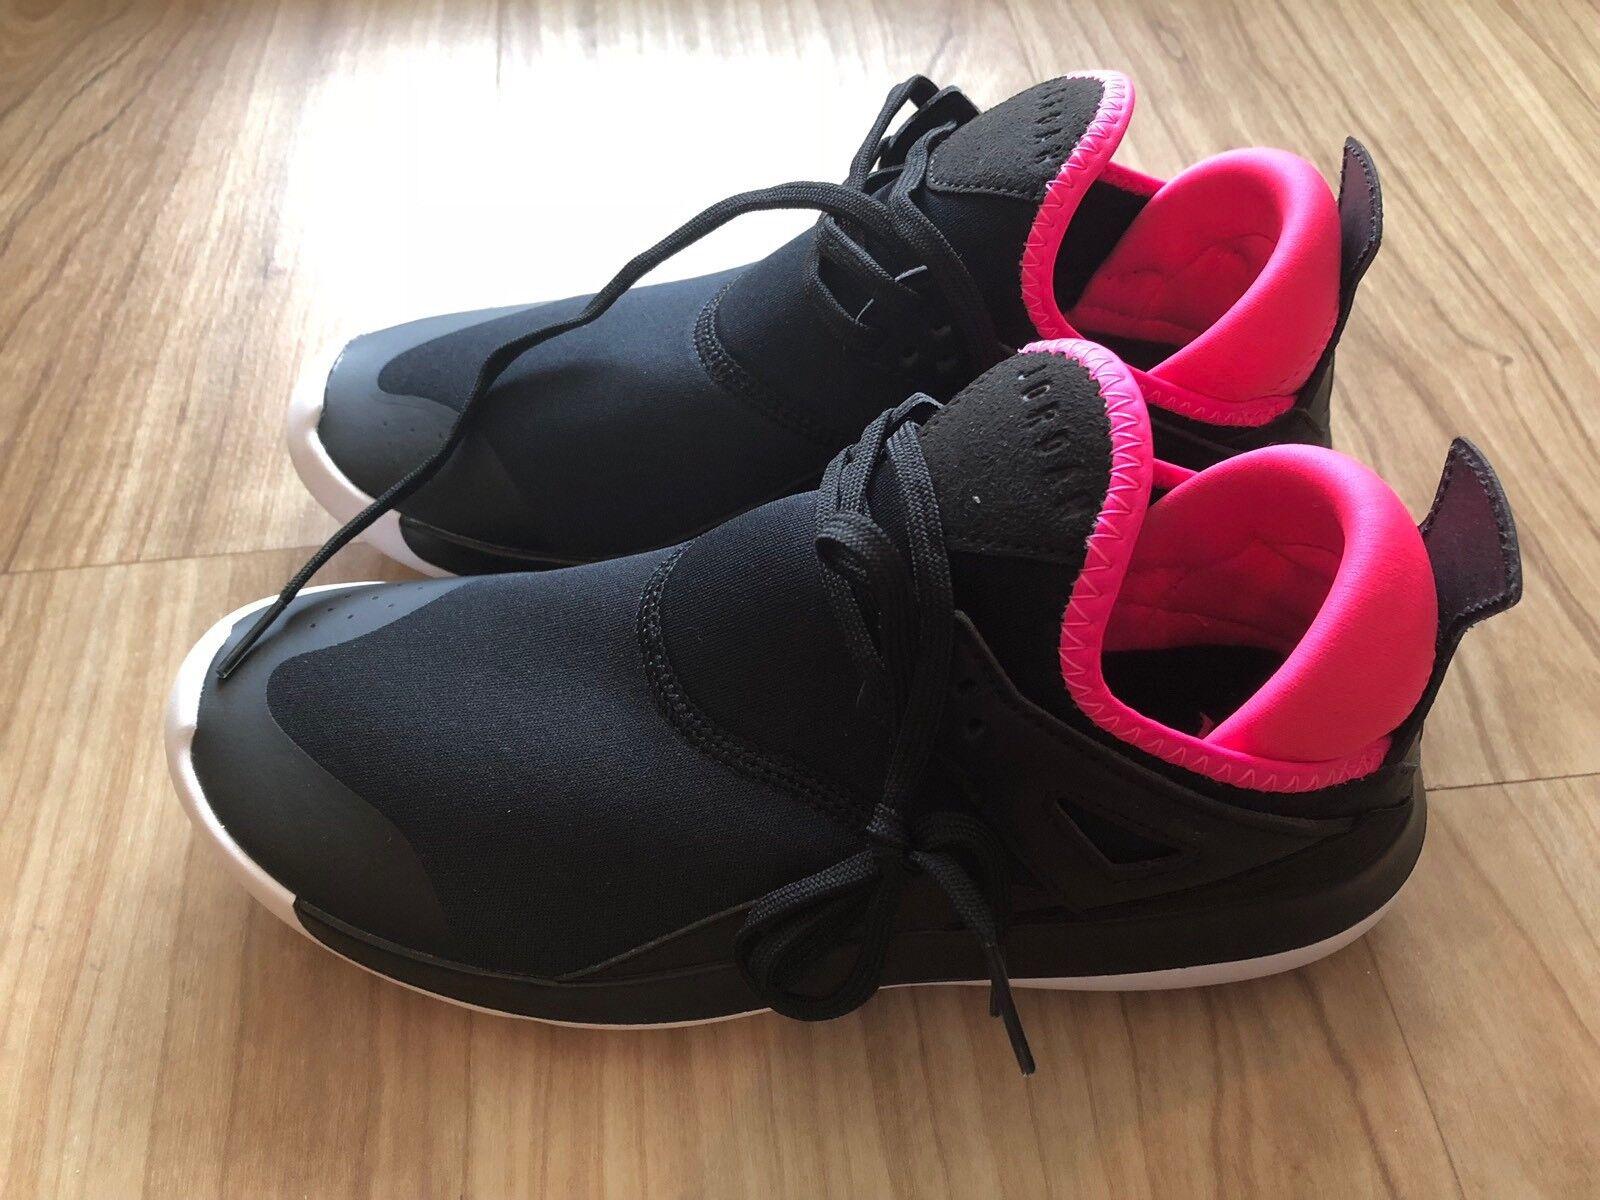 Nike Jordan Schuhe,FLY 89 89 Schuhe,FLY GG,Gr.38 dcd7cb